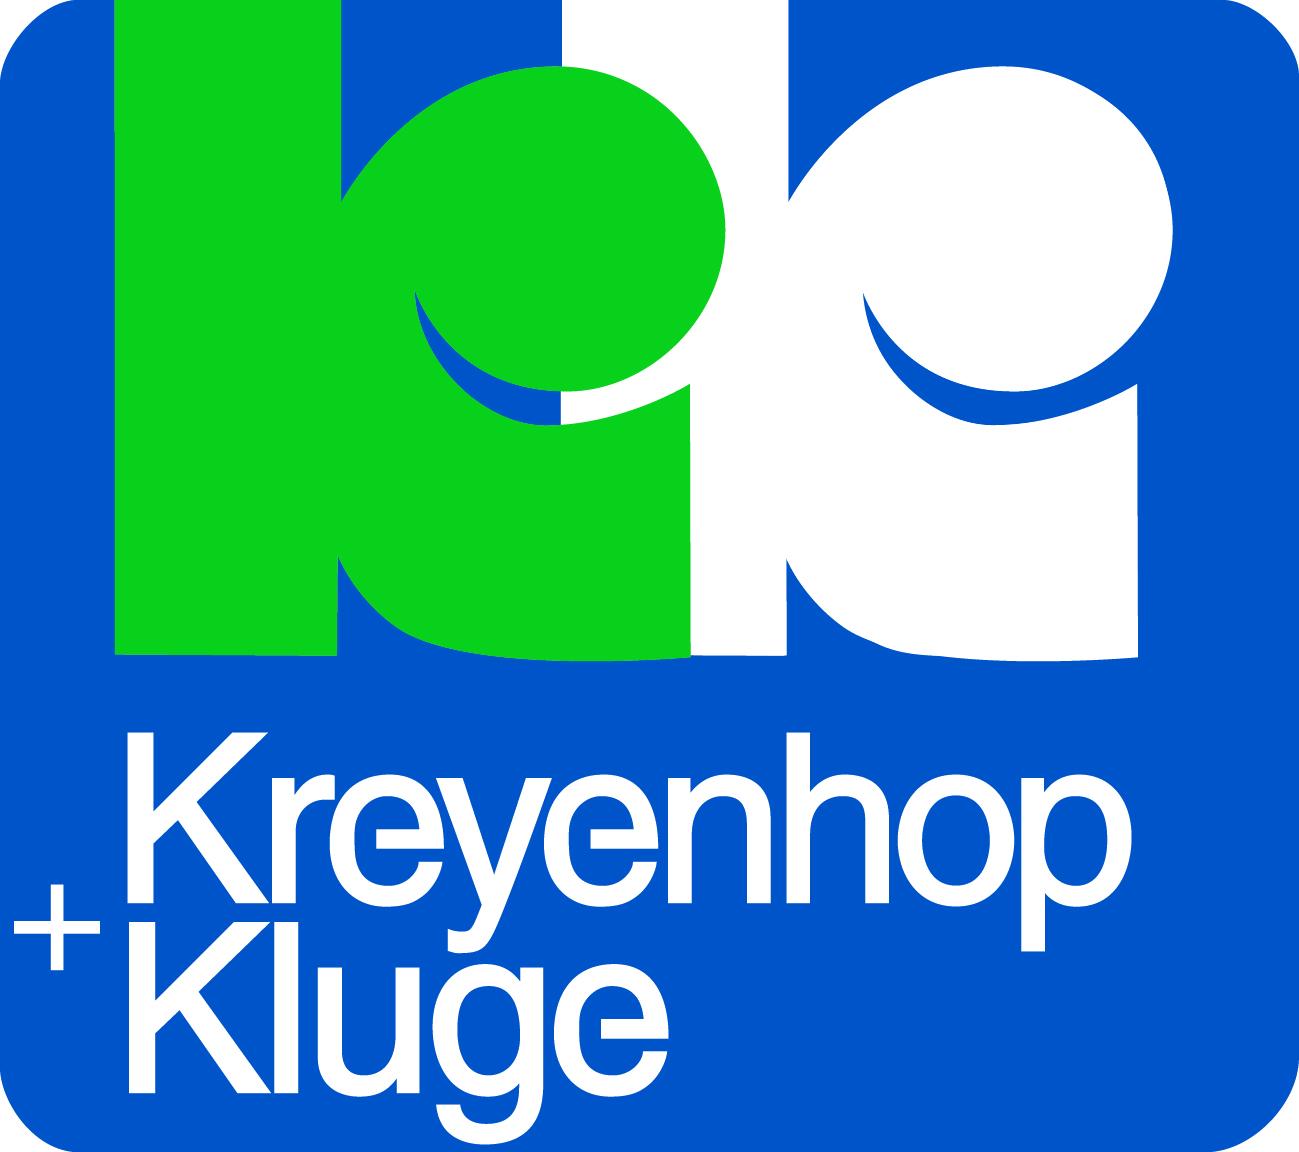 Kreyenhop & Kluge GmbH & Co KG